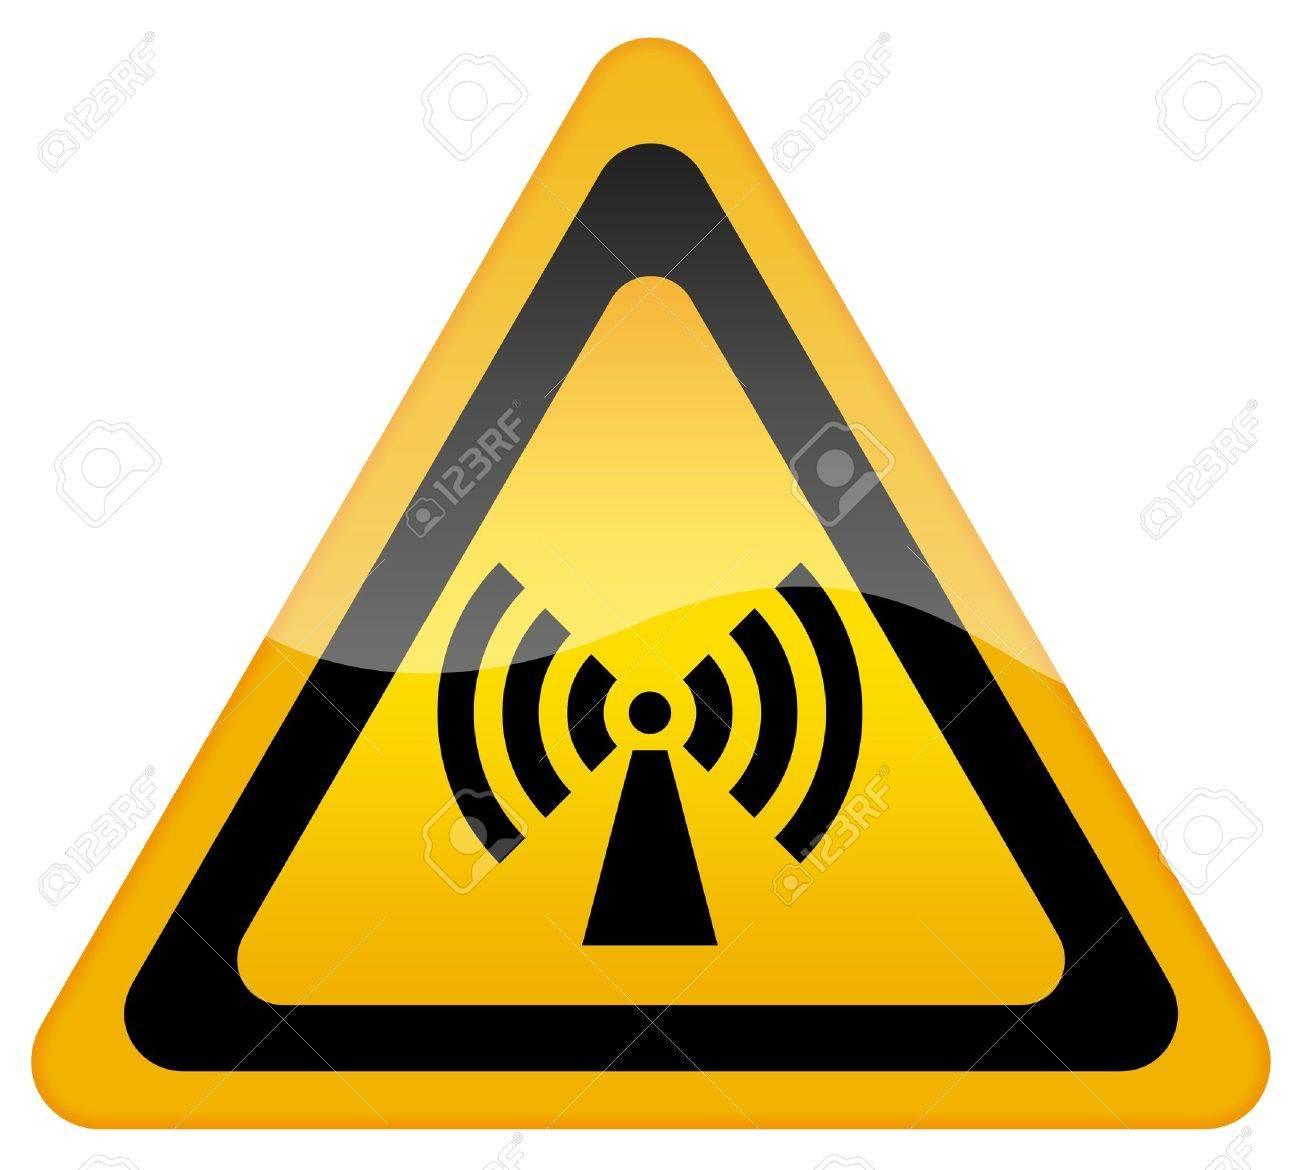 Wireless network sign Stock Photo - 10428511